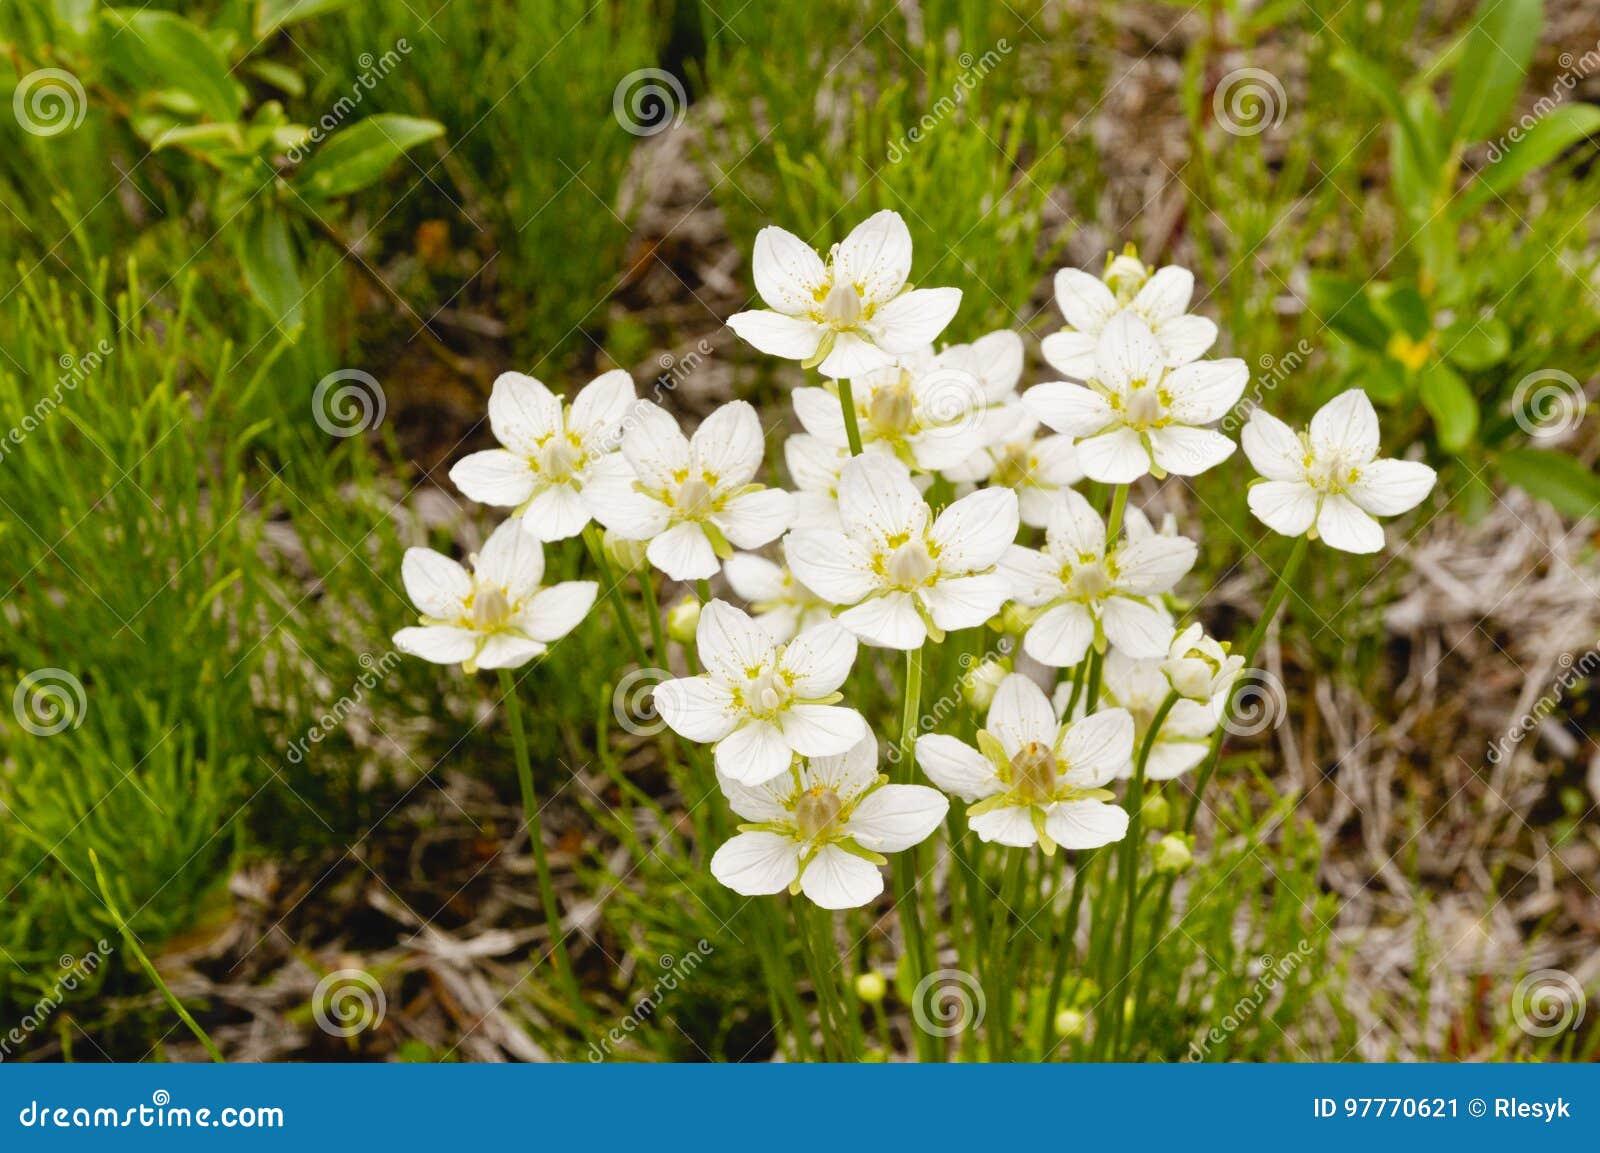 Flowers In The Tundra Stock Image Image Of Yukon White 97770621